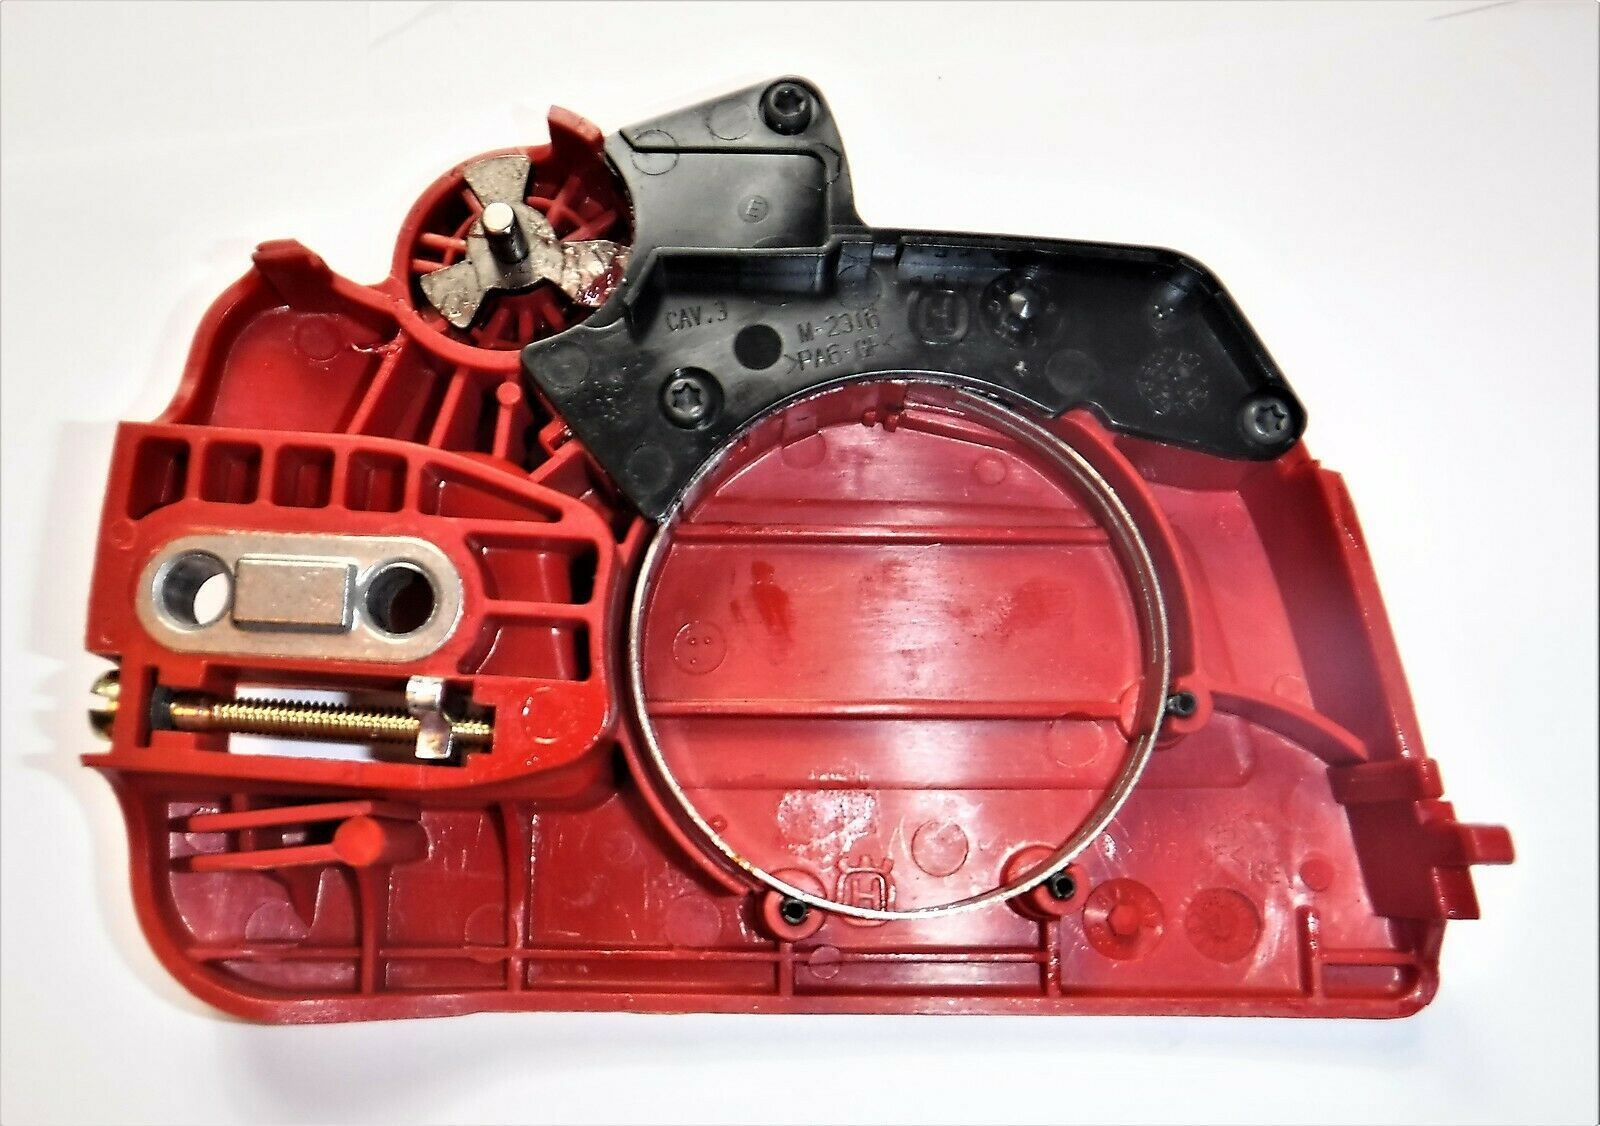 OEM Jonsered CS 2255 Chainsaw Air filter and  Spark Plug